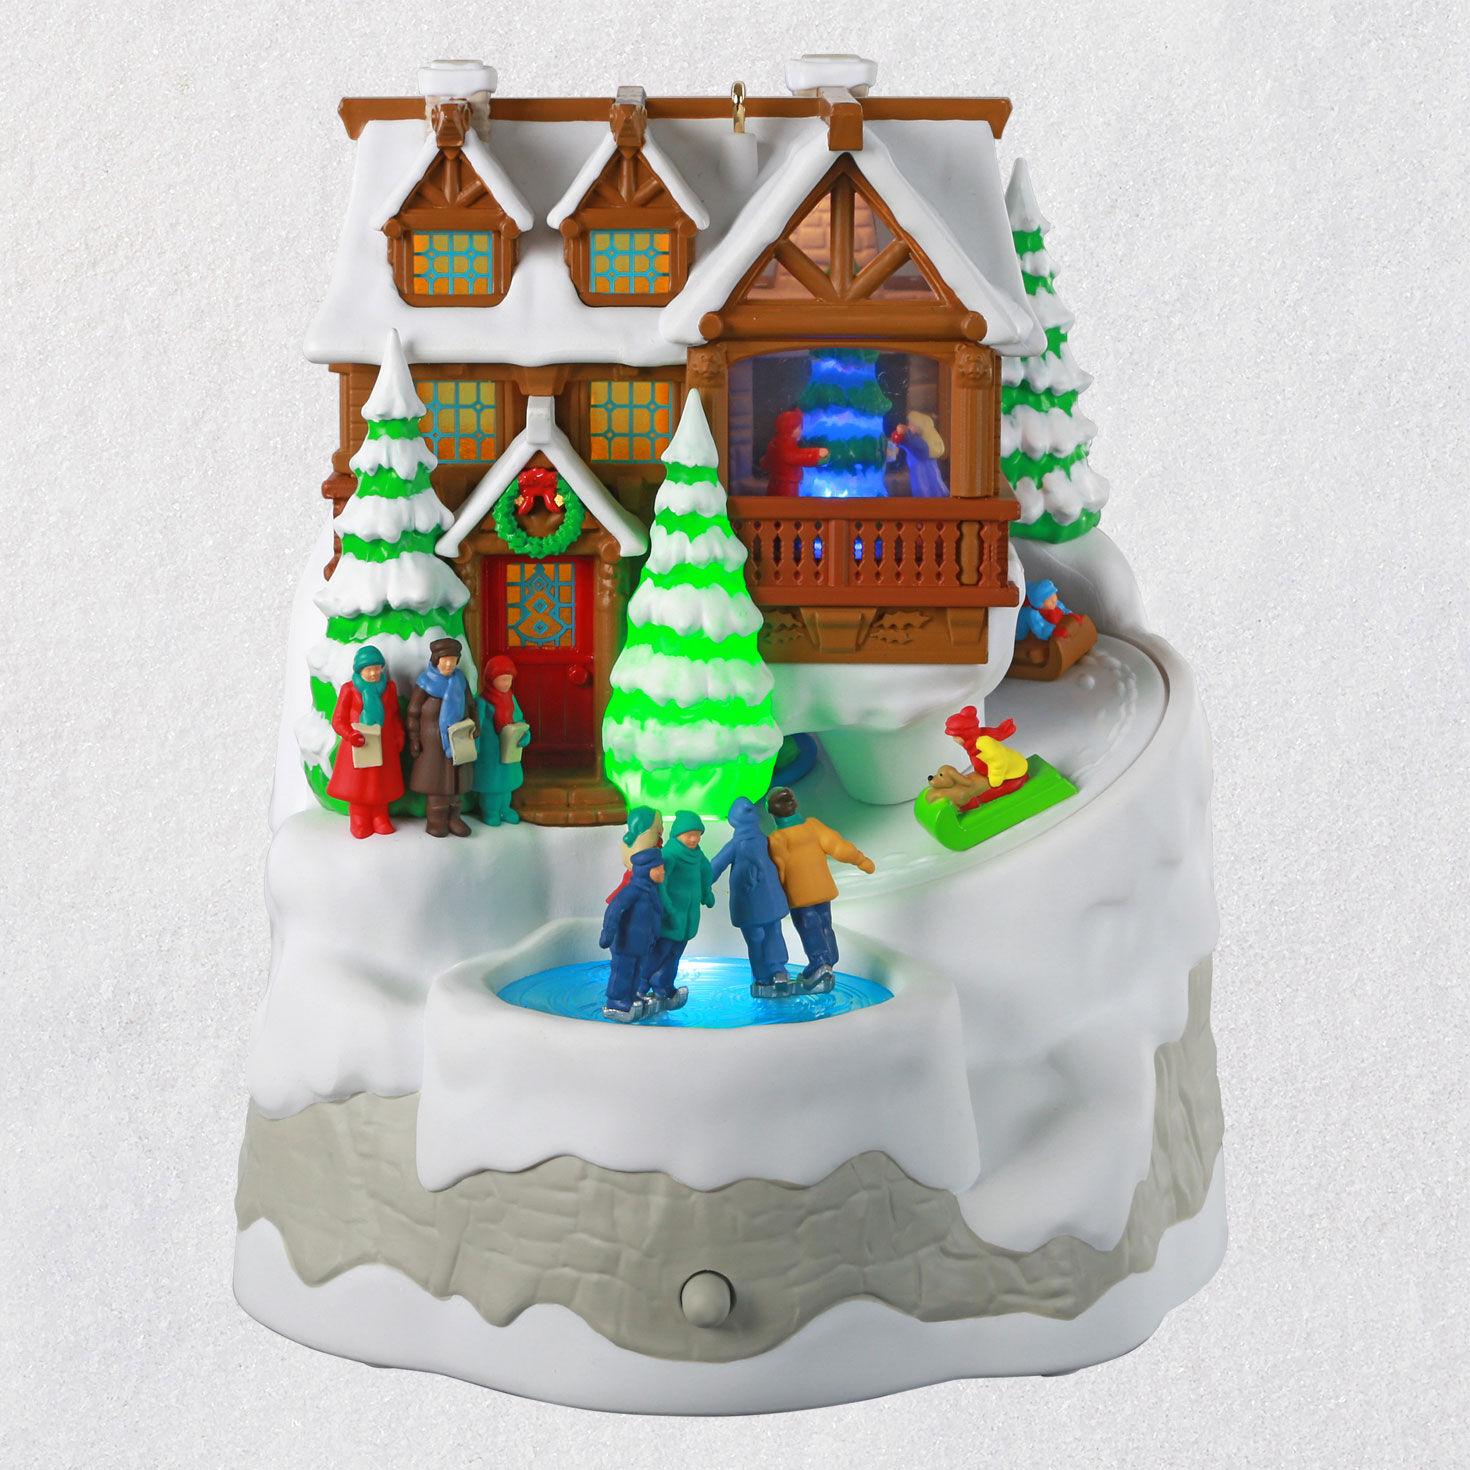 Christmas Cabin Musical Ornament With Light And Motion Keepsake Ornaments Hallmark